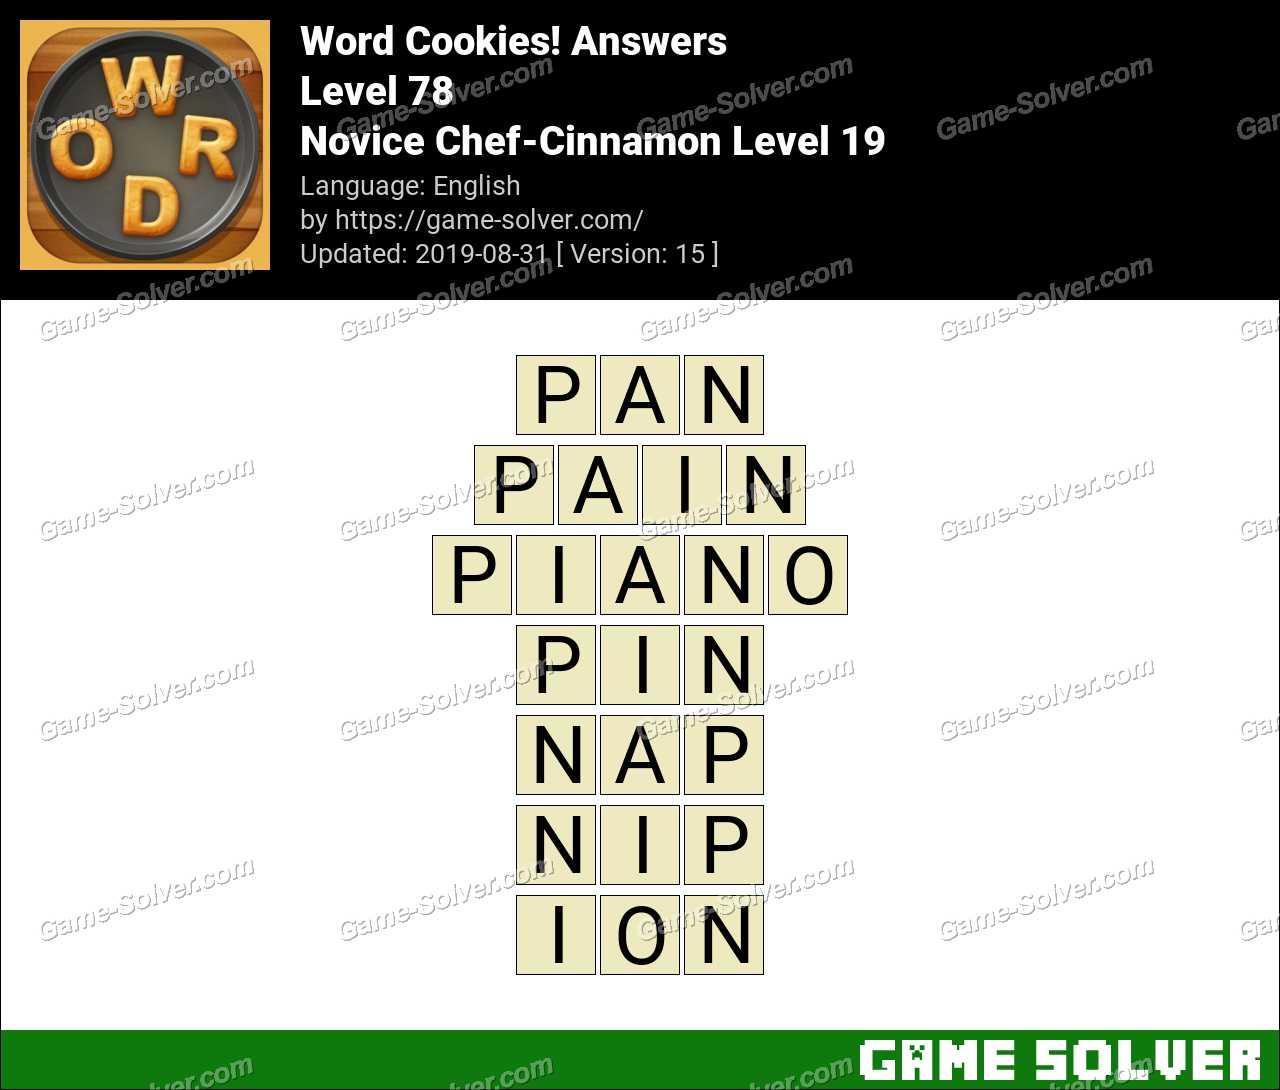 Word Cookies Novice Chef-Cinnamon Level 19 Answers